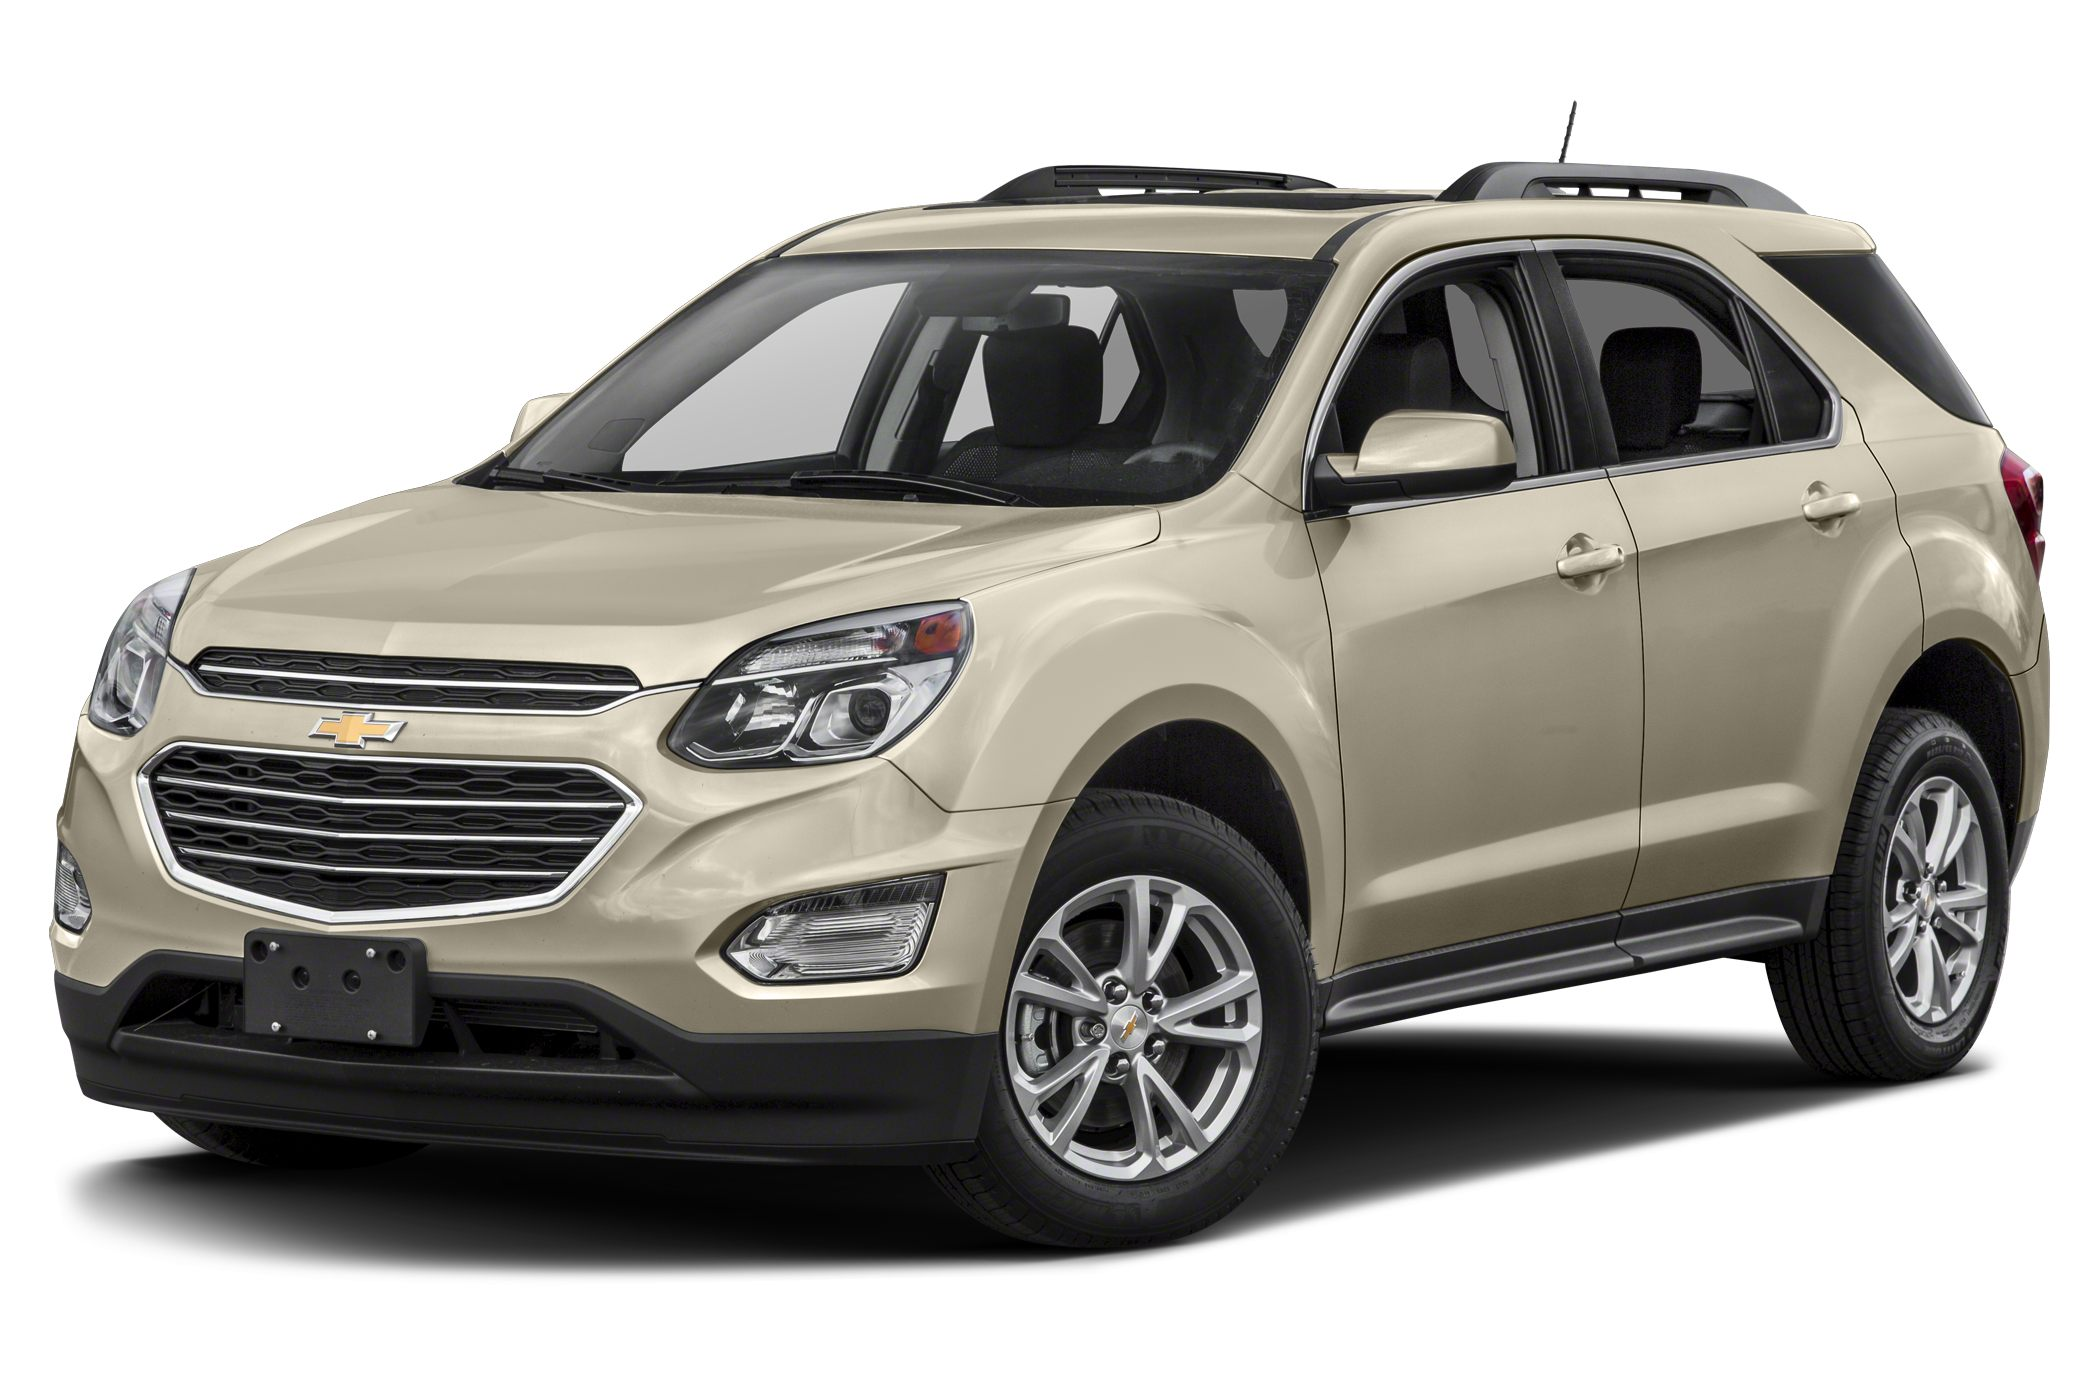 2017 Chevrolet Equinox Lt W 1lt Front